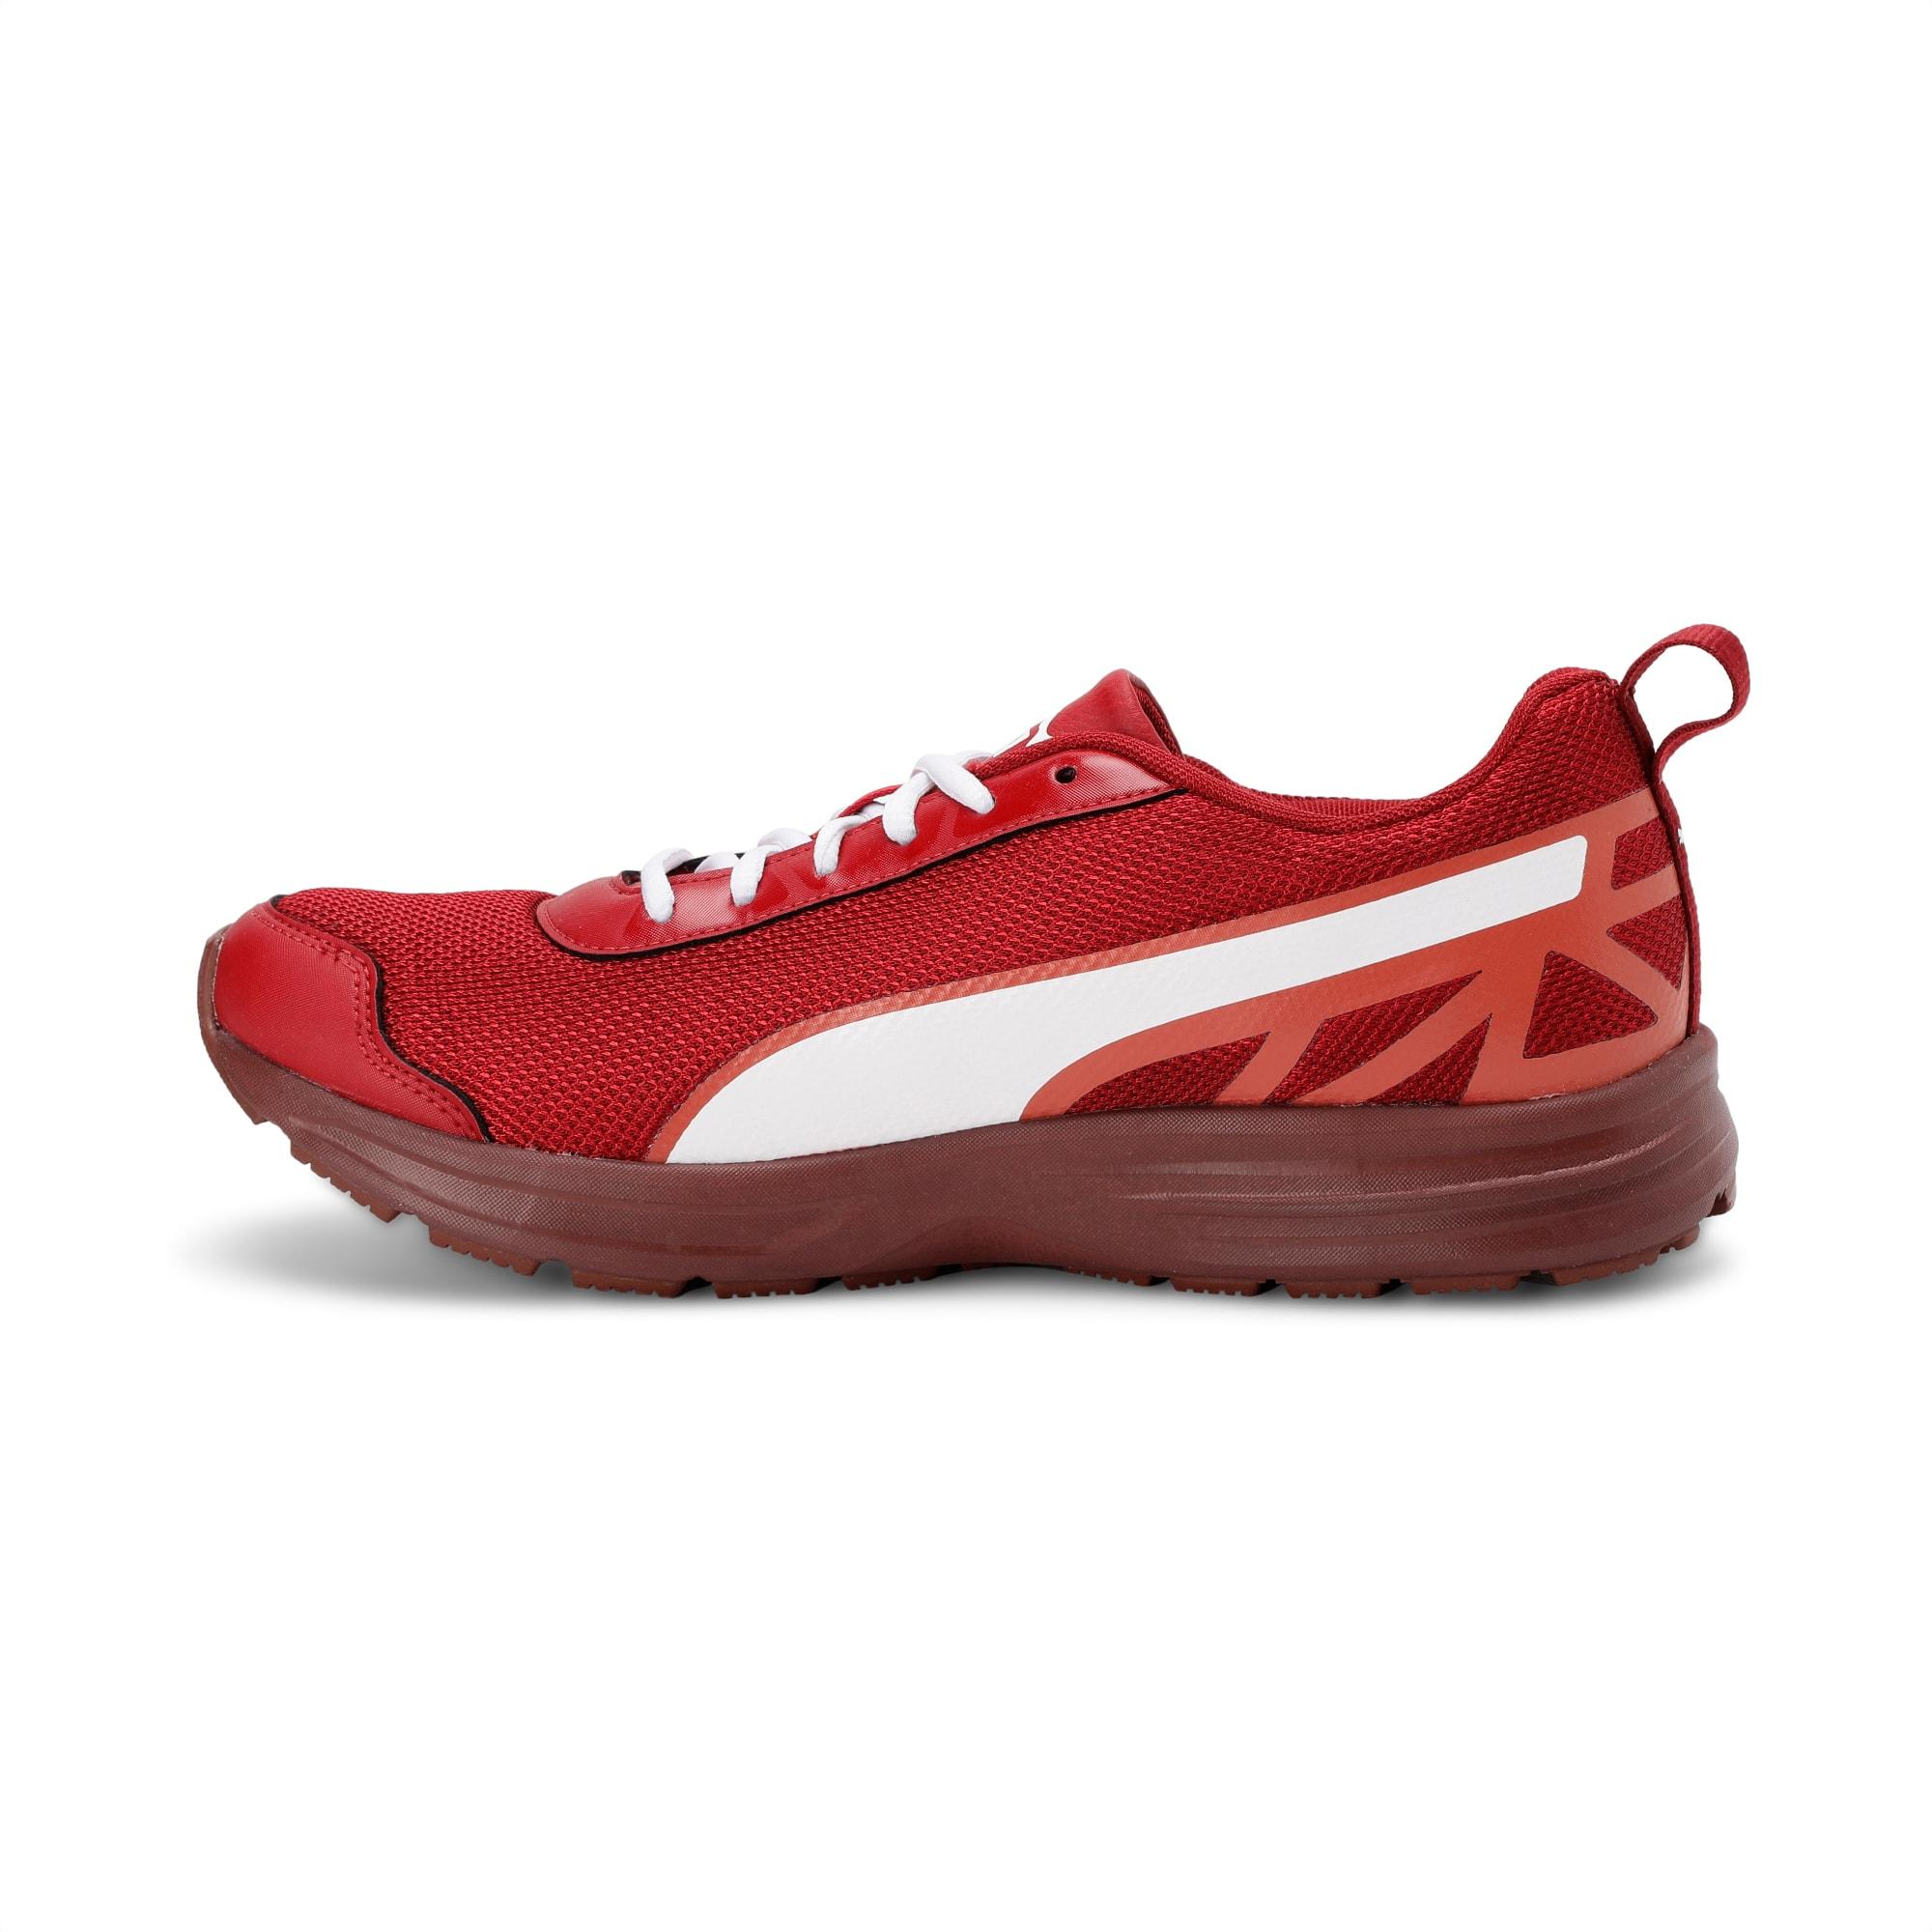 tirar a la basura coser Accidental  Free Feet 2 Men's Running Shoes | Rd Dahlia-Bossa Nva-Puma Wht | PUMA Shoes  | PUMA